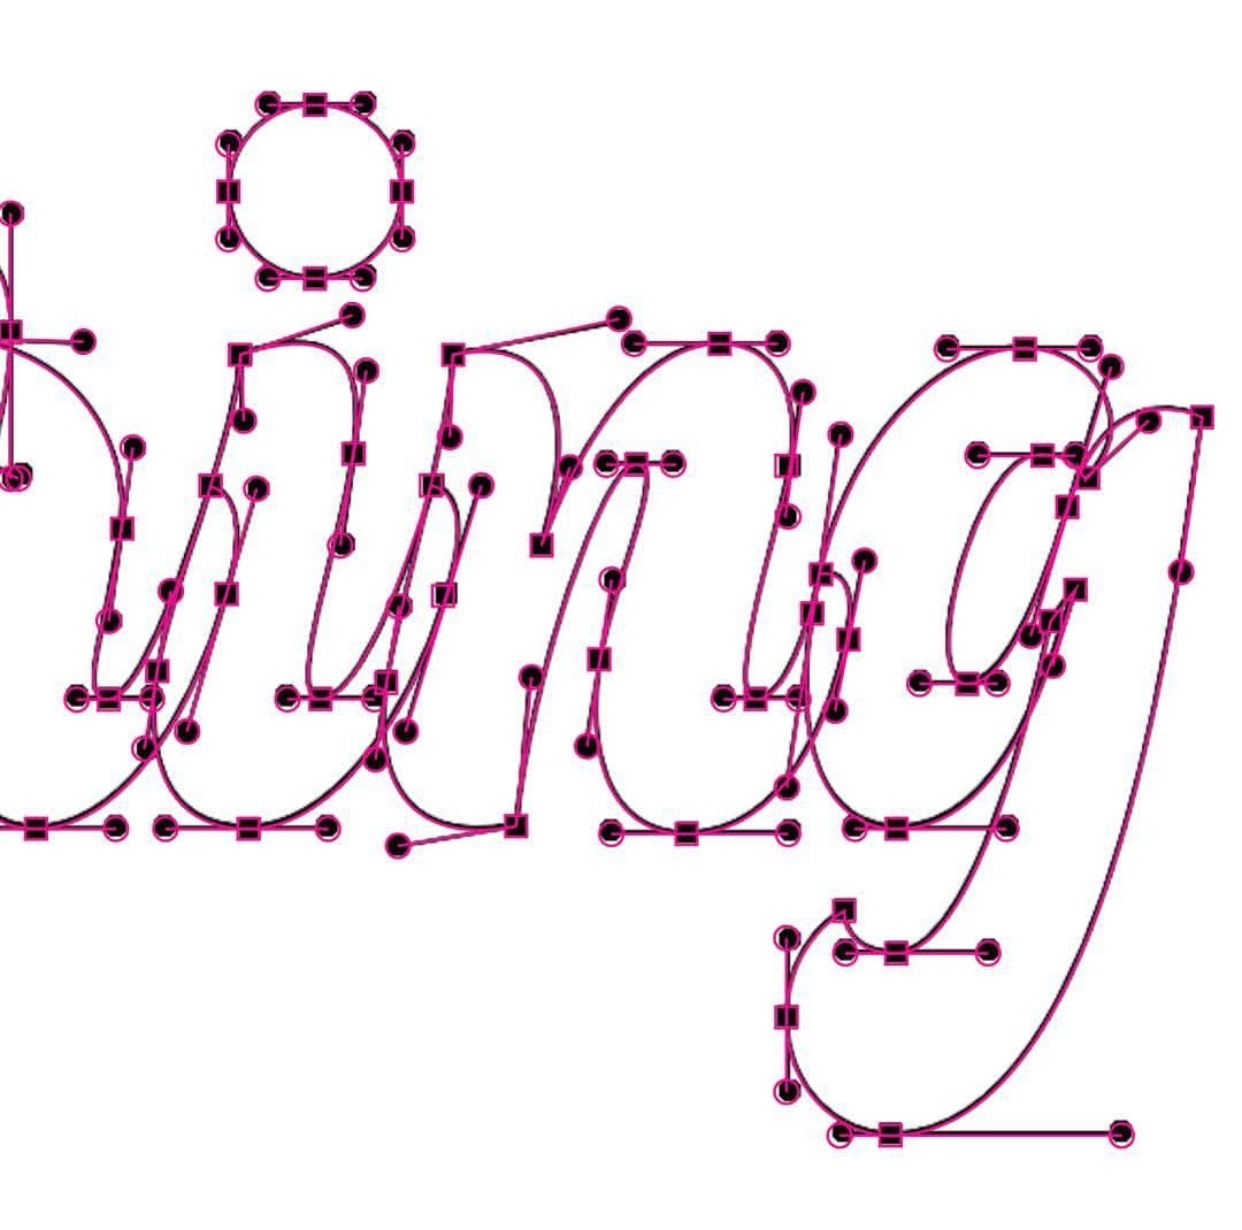 Pin by Mackenzie Perez on Script Arabic calligraphy